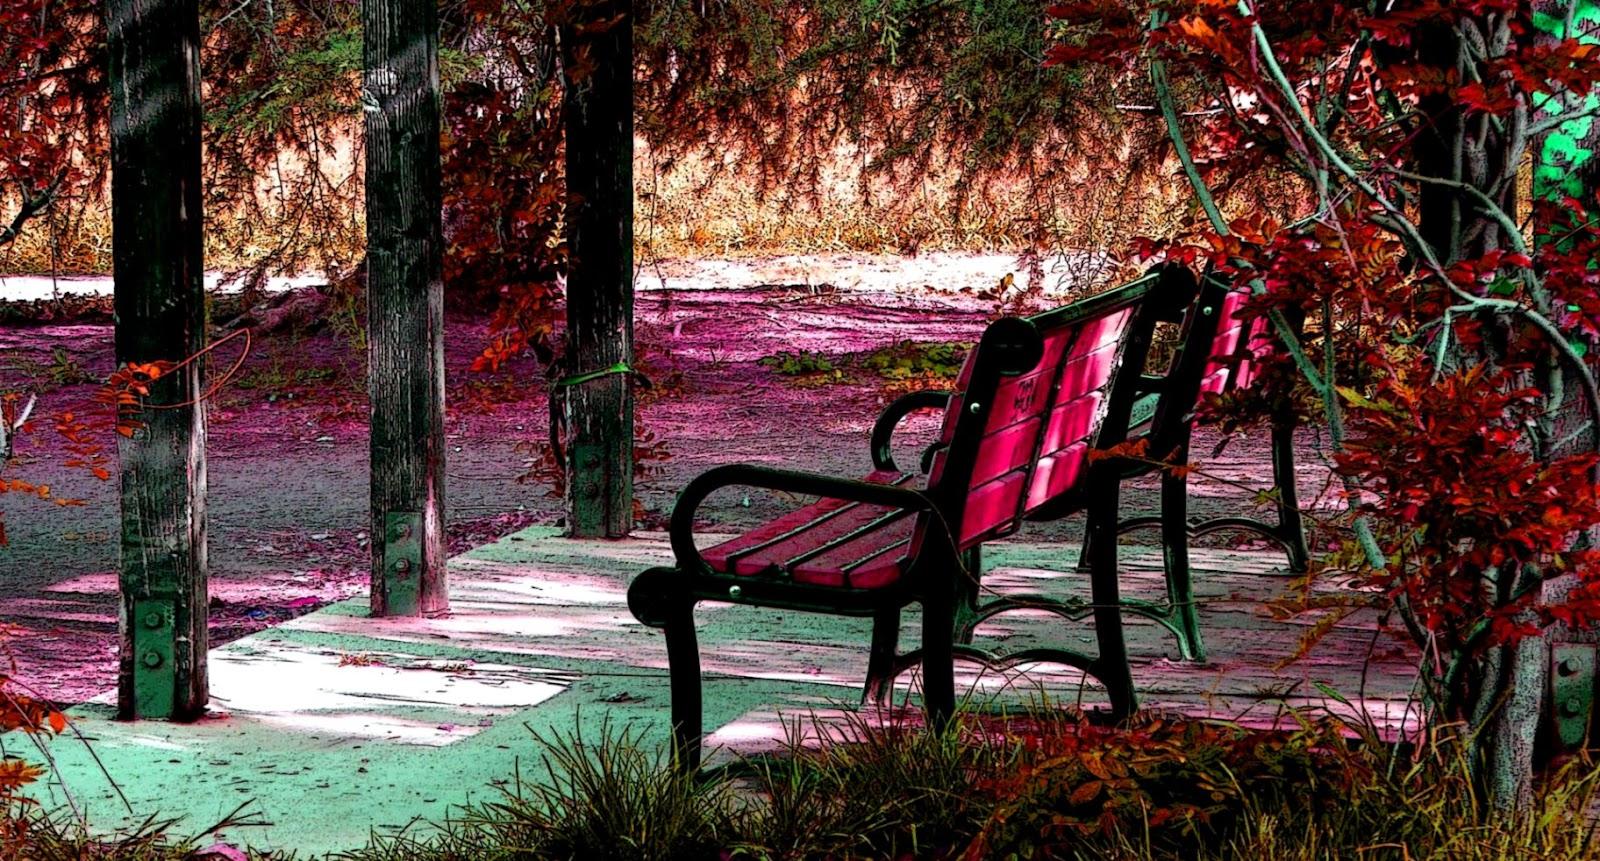 Bench Autumn Nature Wallpapers Hd Desktop Barong Wallpapers